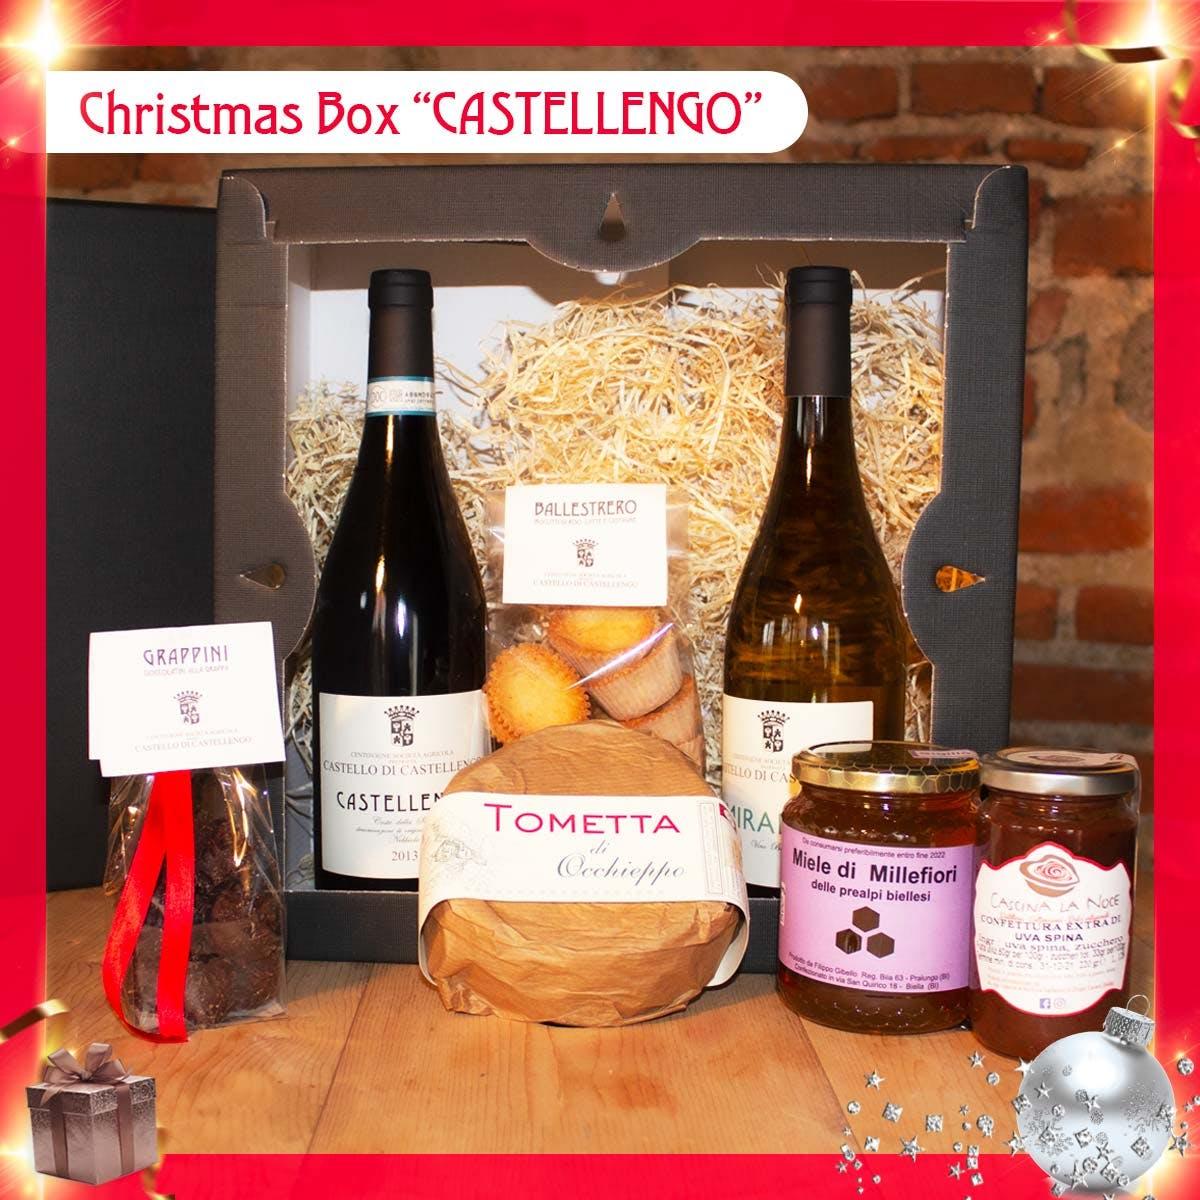 Christmas Box - Castellengo